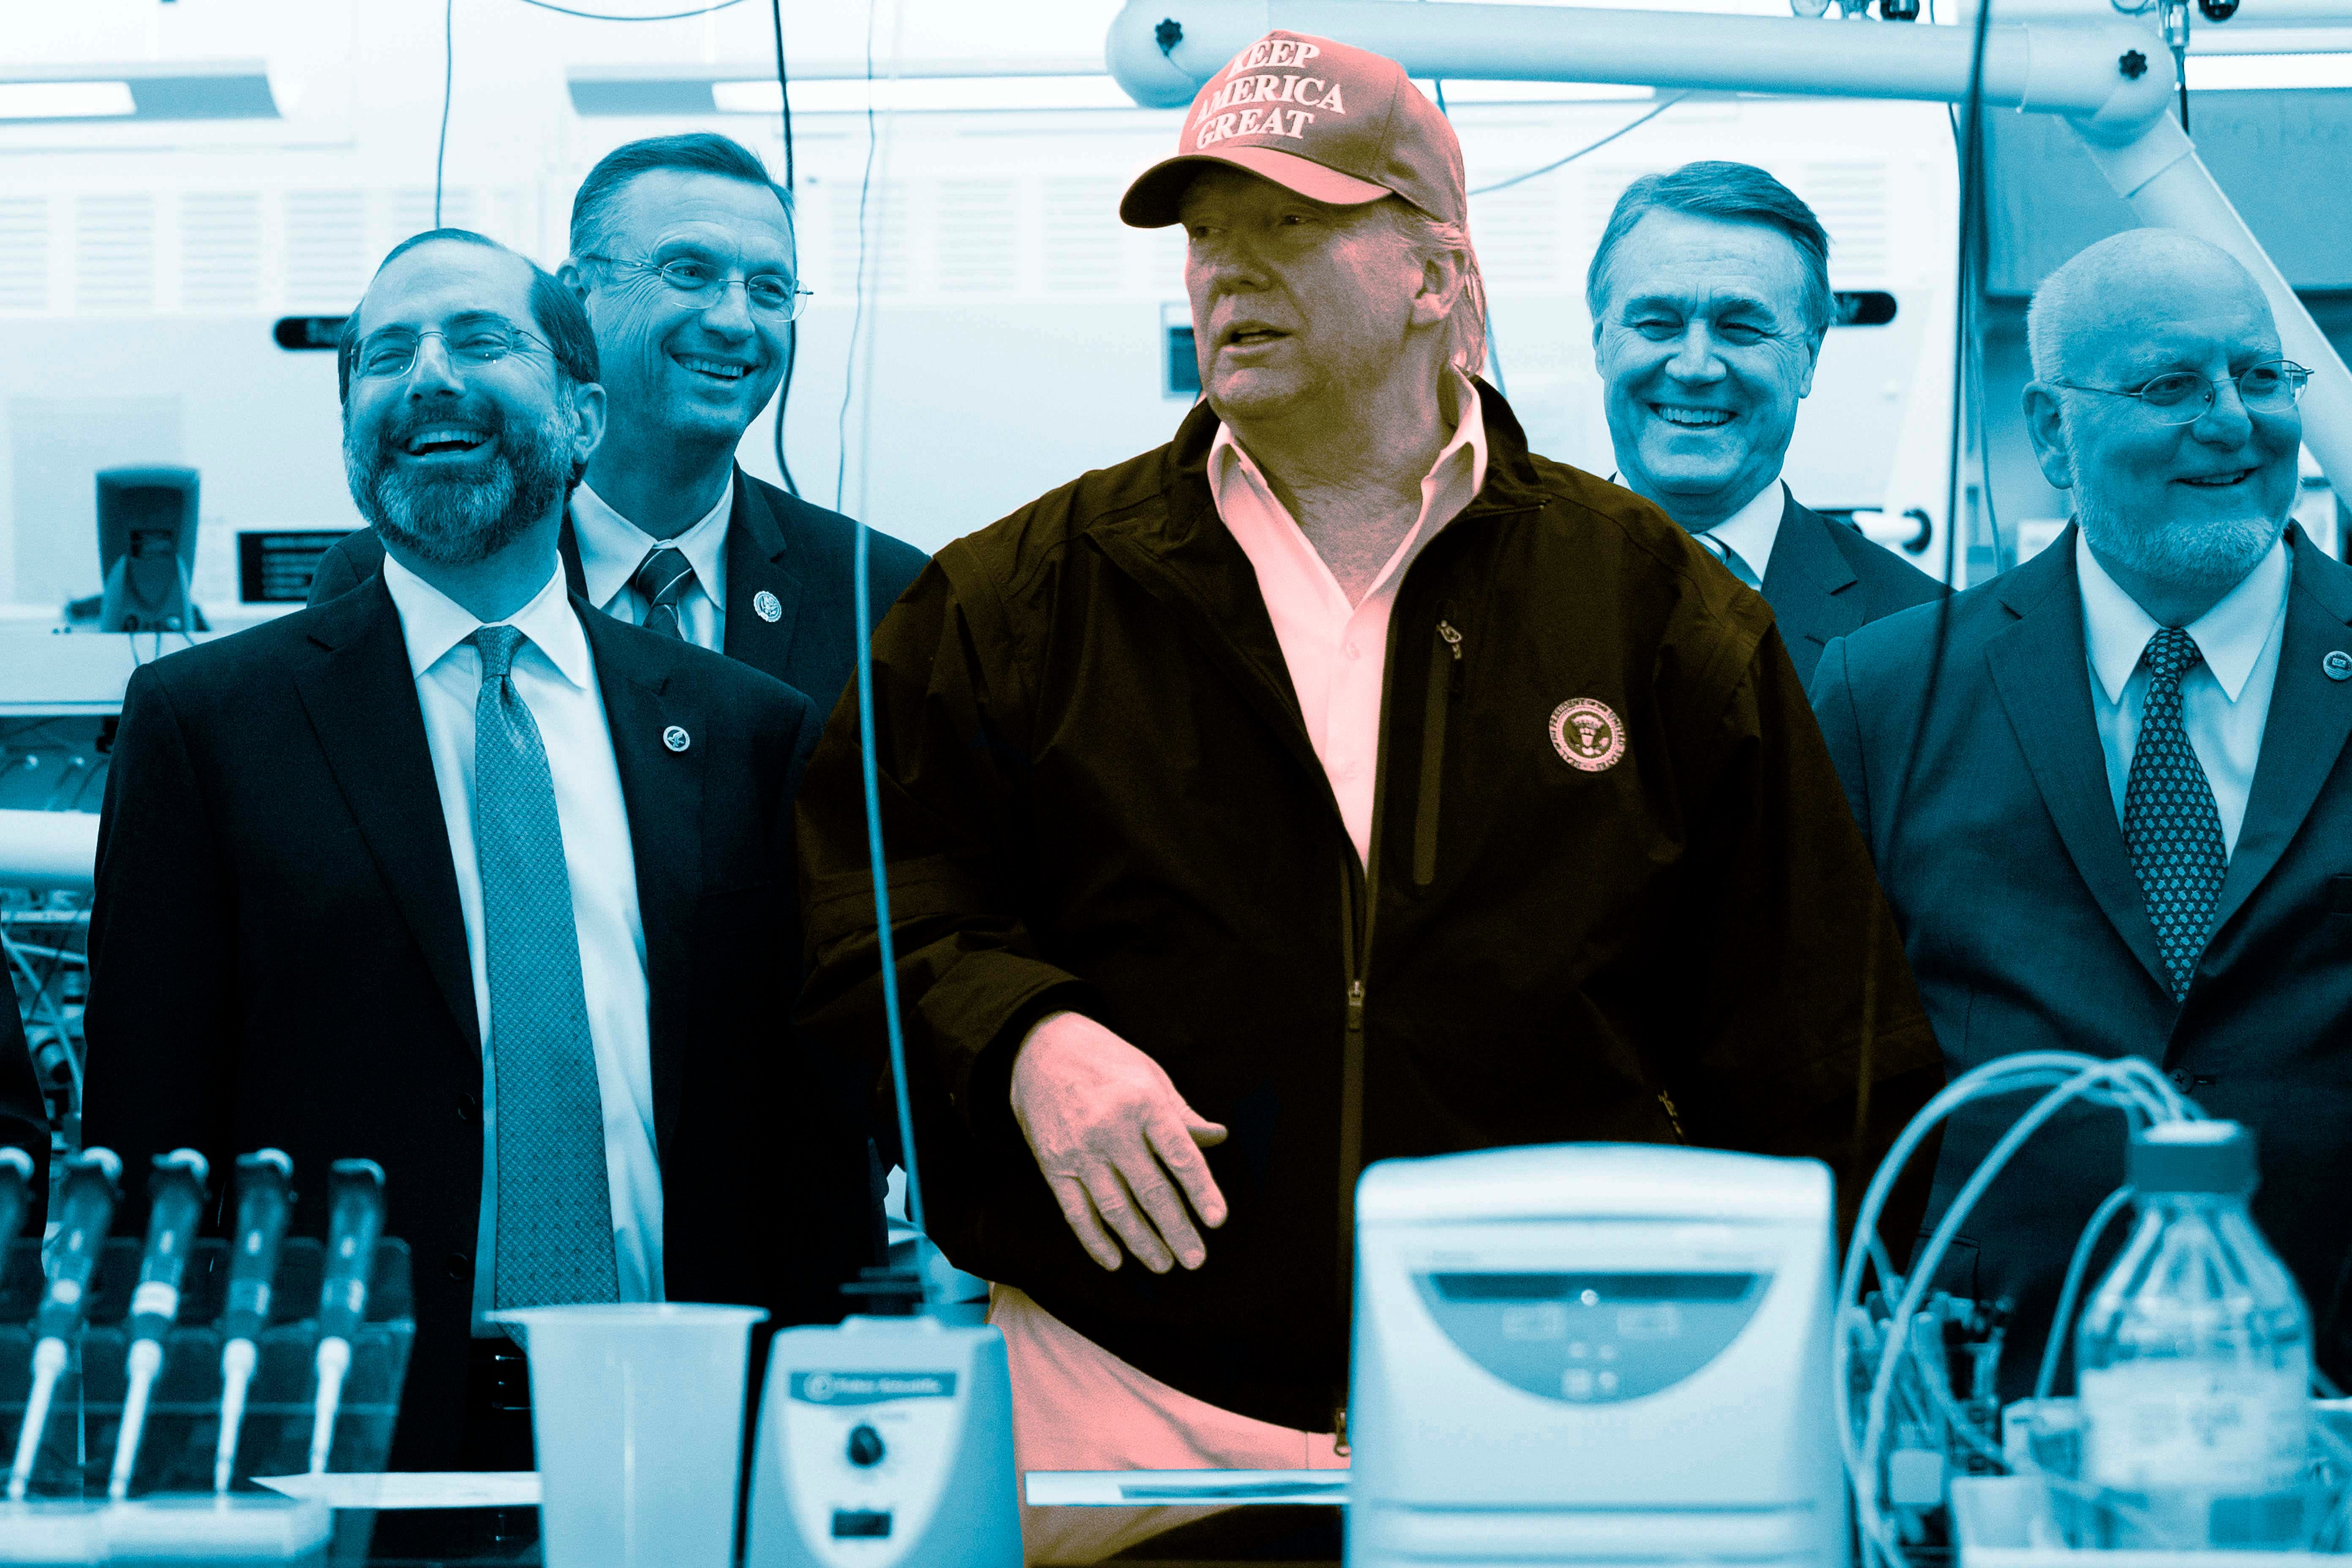 Trump tours the CDC.